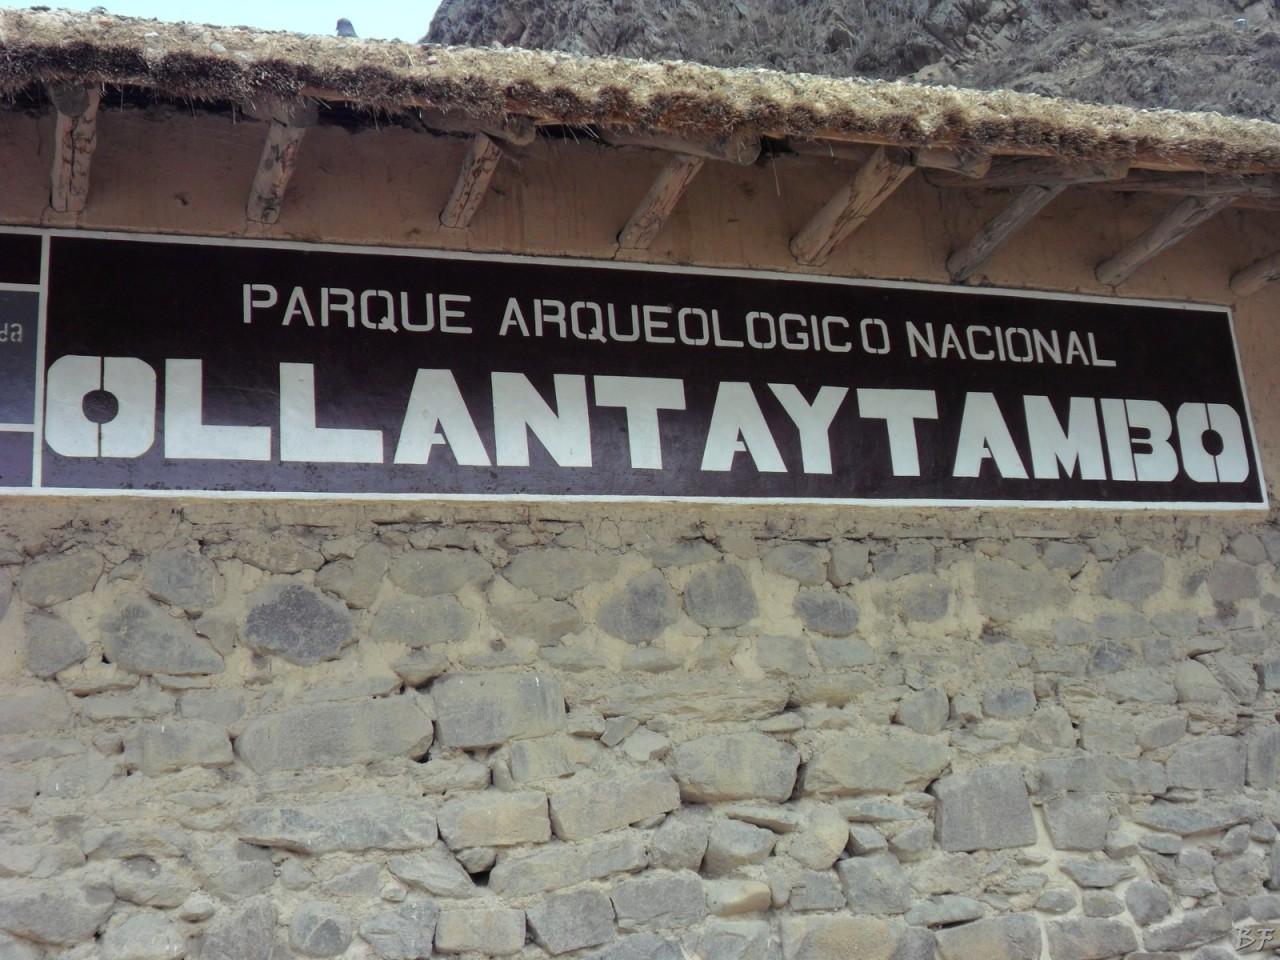 Ollantaytambo-Mura-Megalitiche-Peru-11